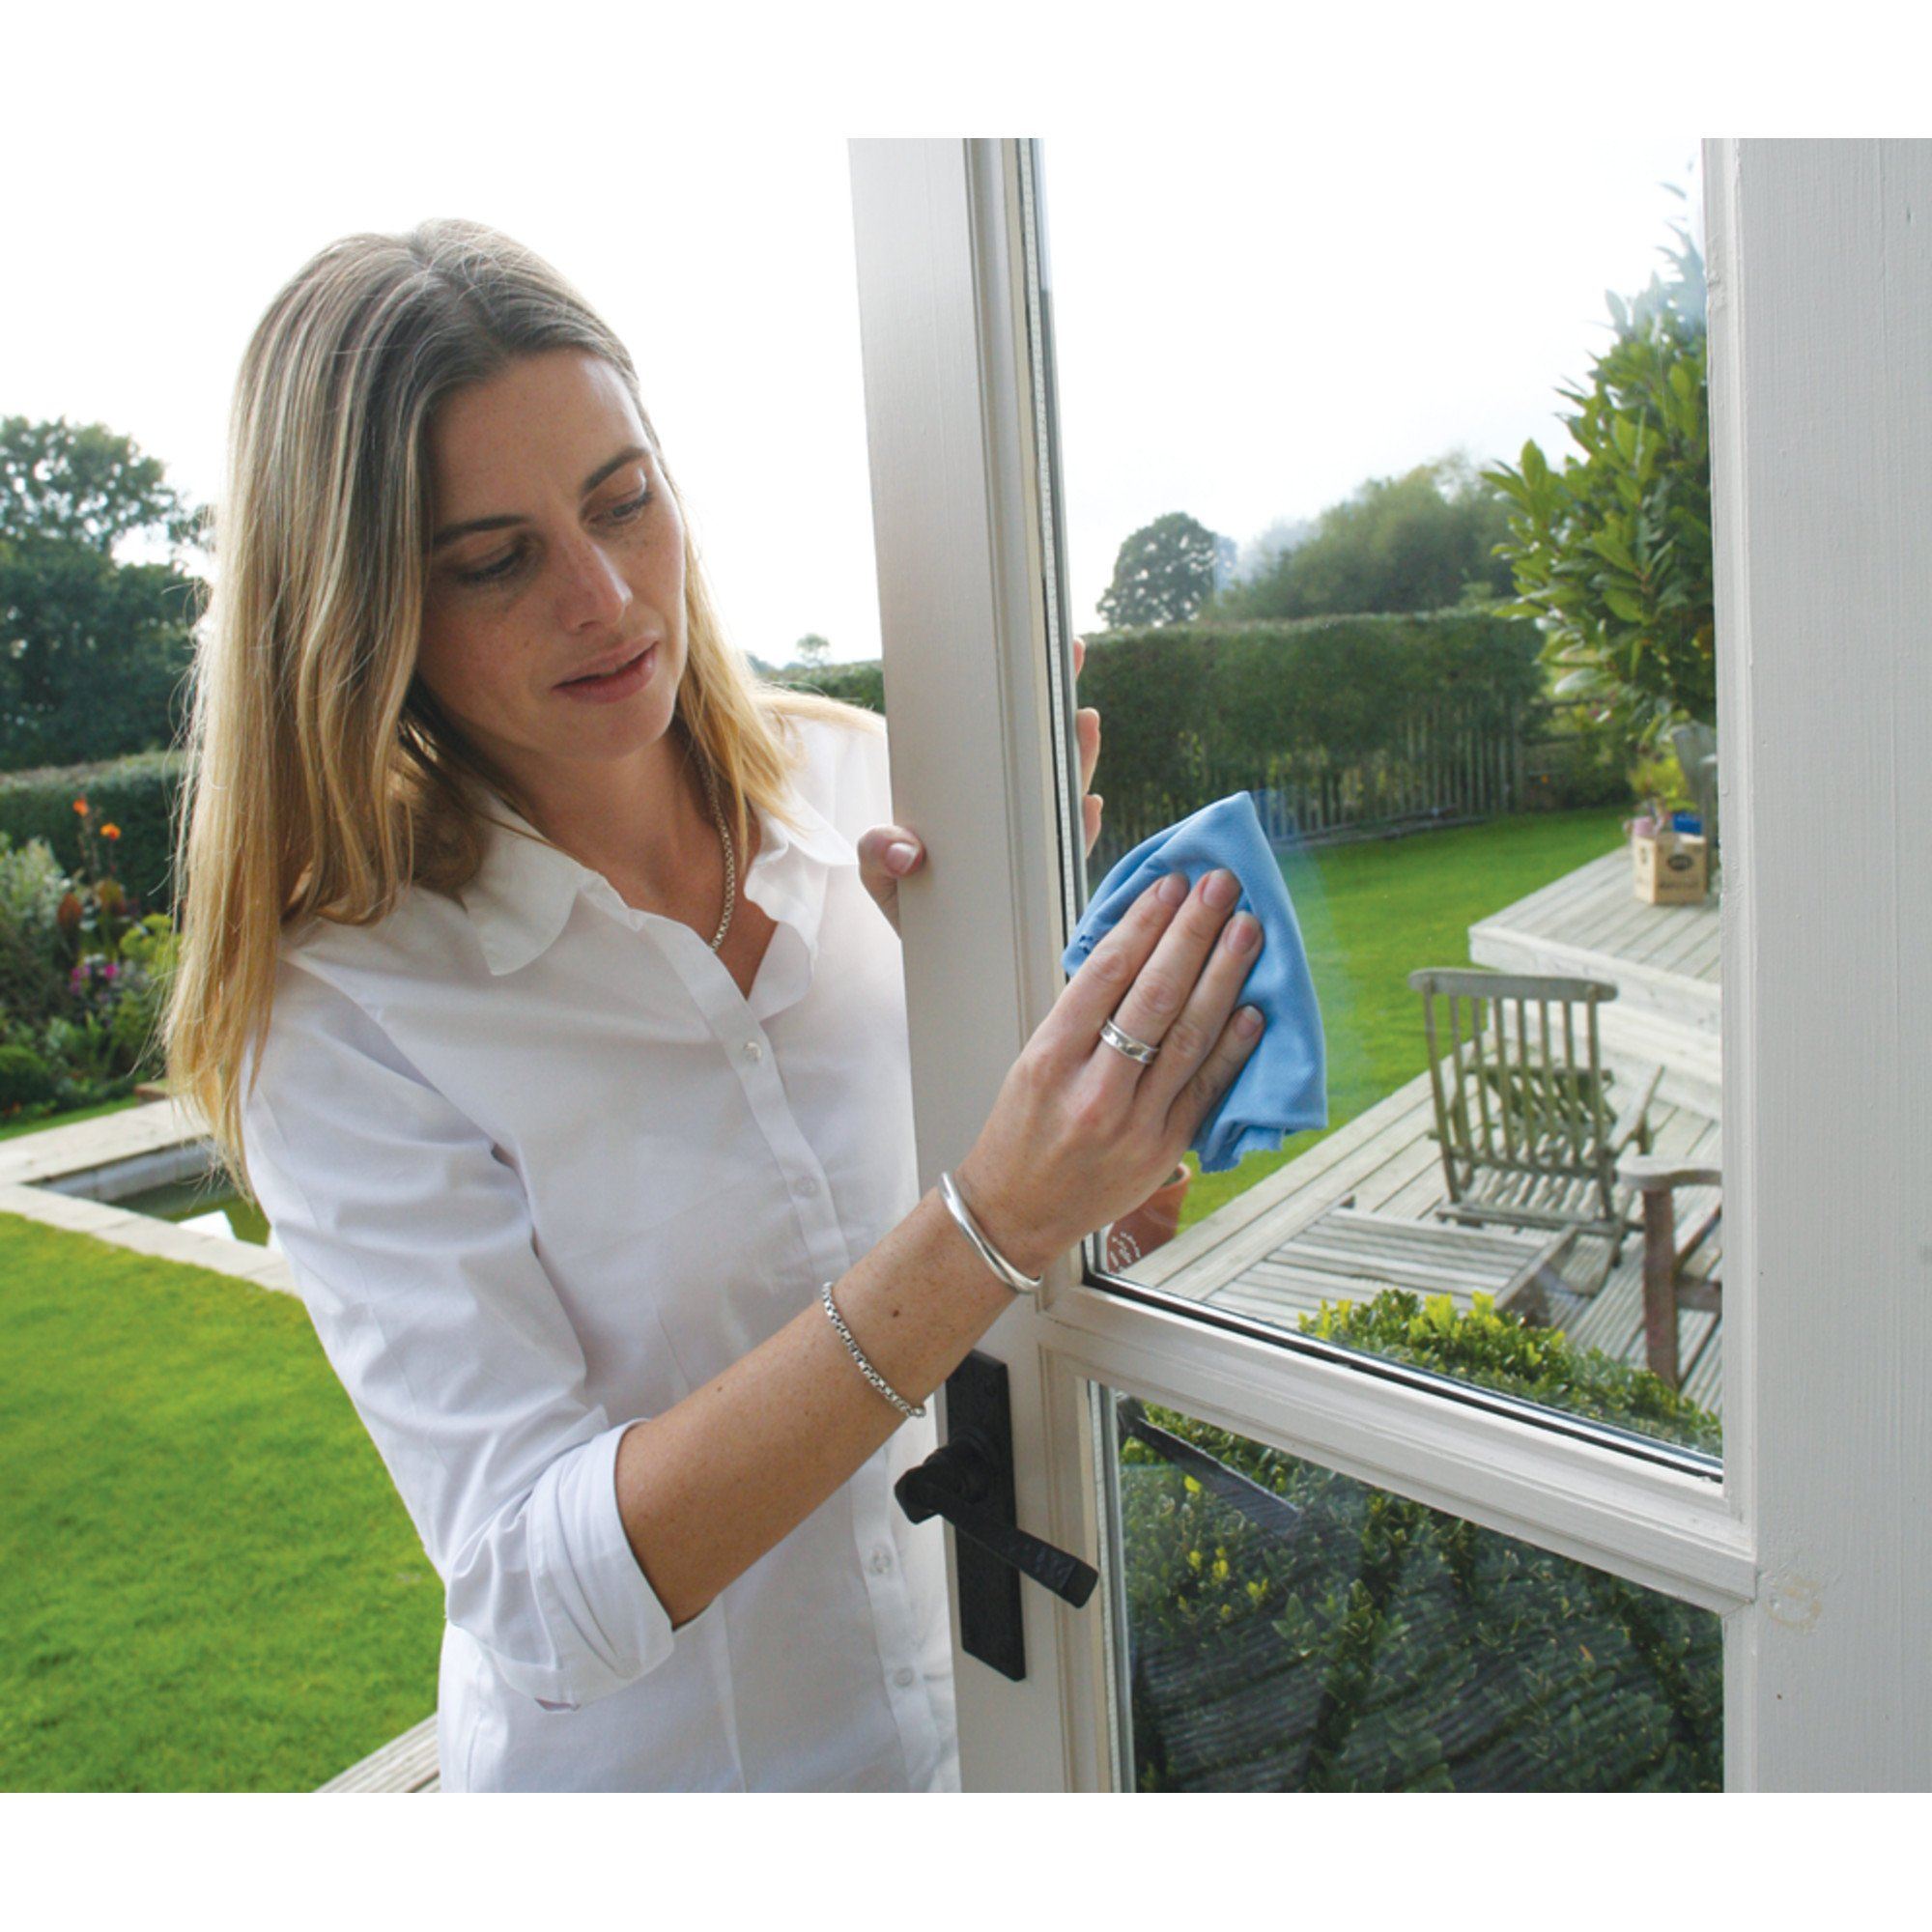 Glass & Polishing Cloth - Brilliant for Sparkling Windows, Mirrors, Glassware, Chrome, and More by E-Cloth (Image #24)